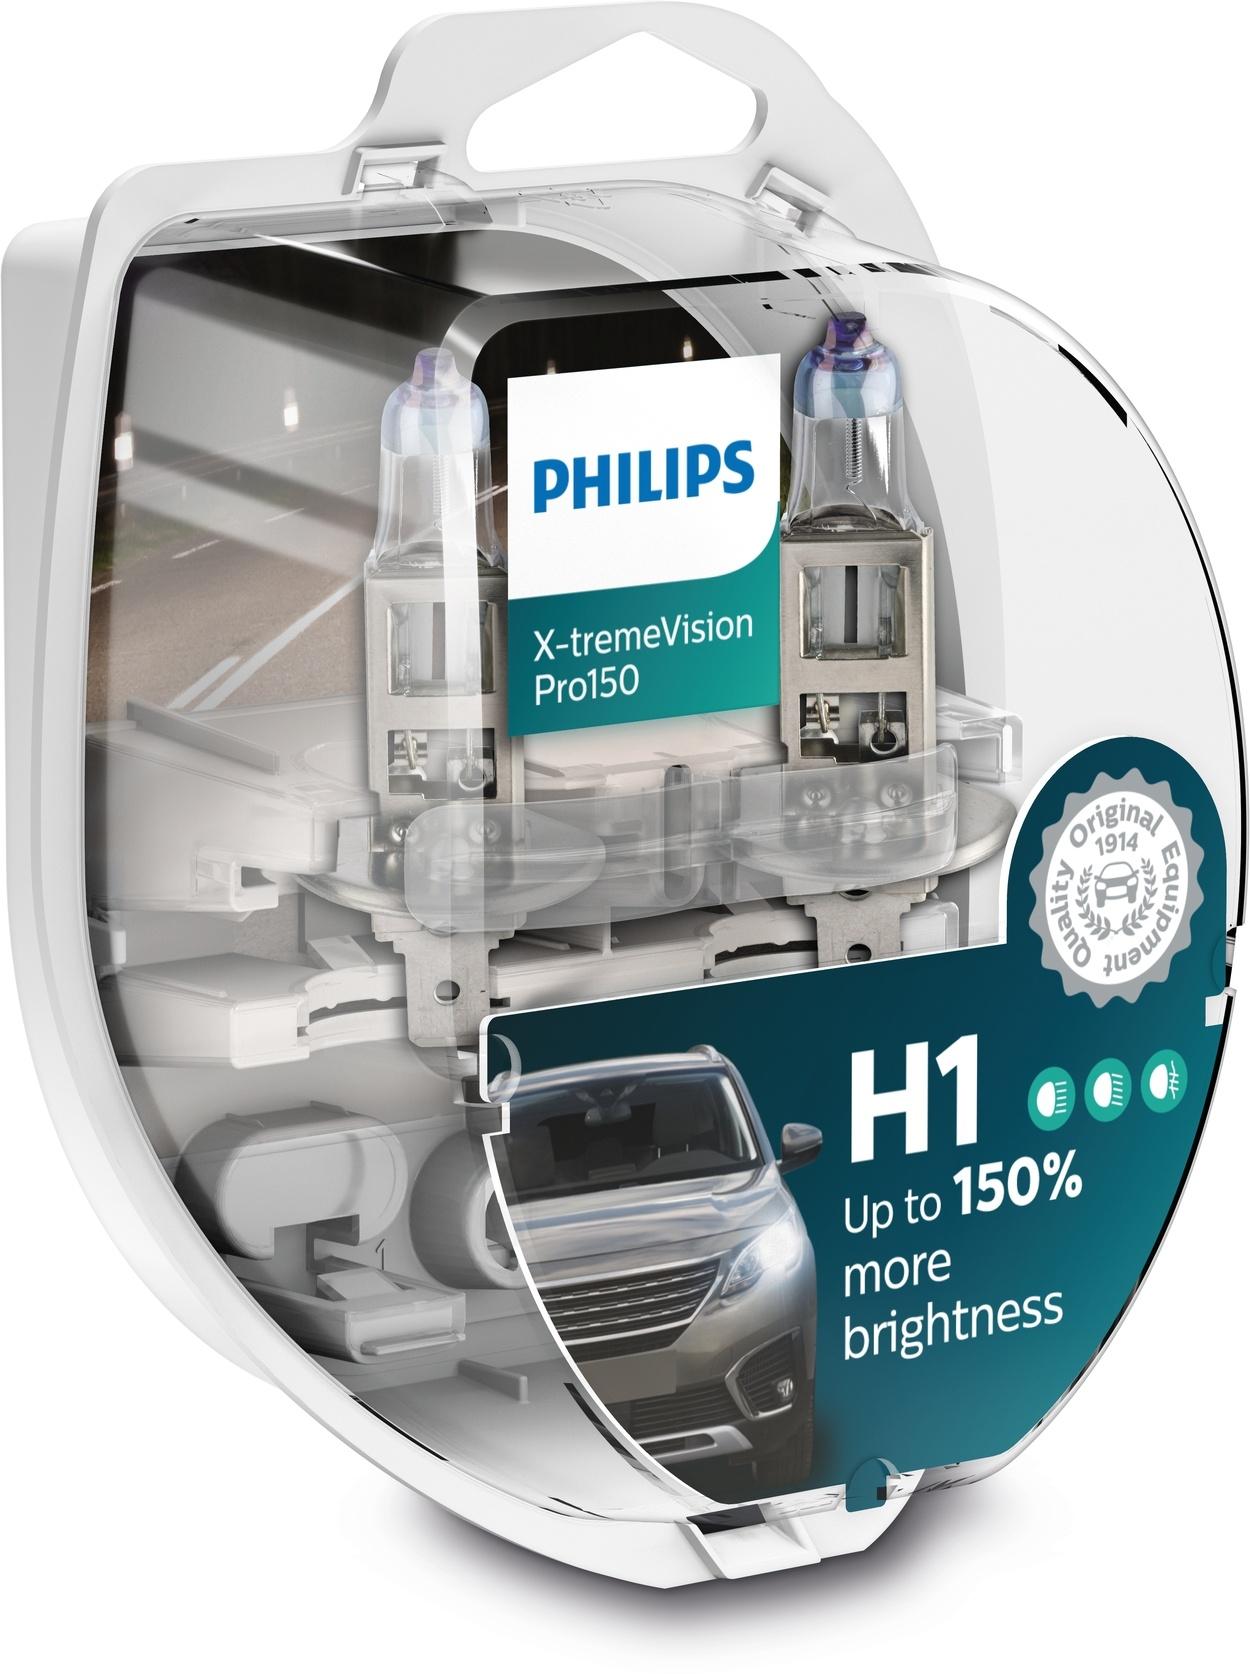 Philips H1 XtremeVision Pro150 Duobox